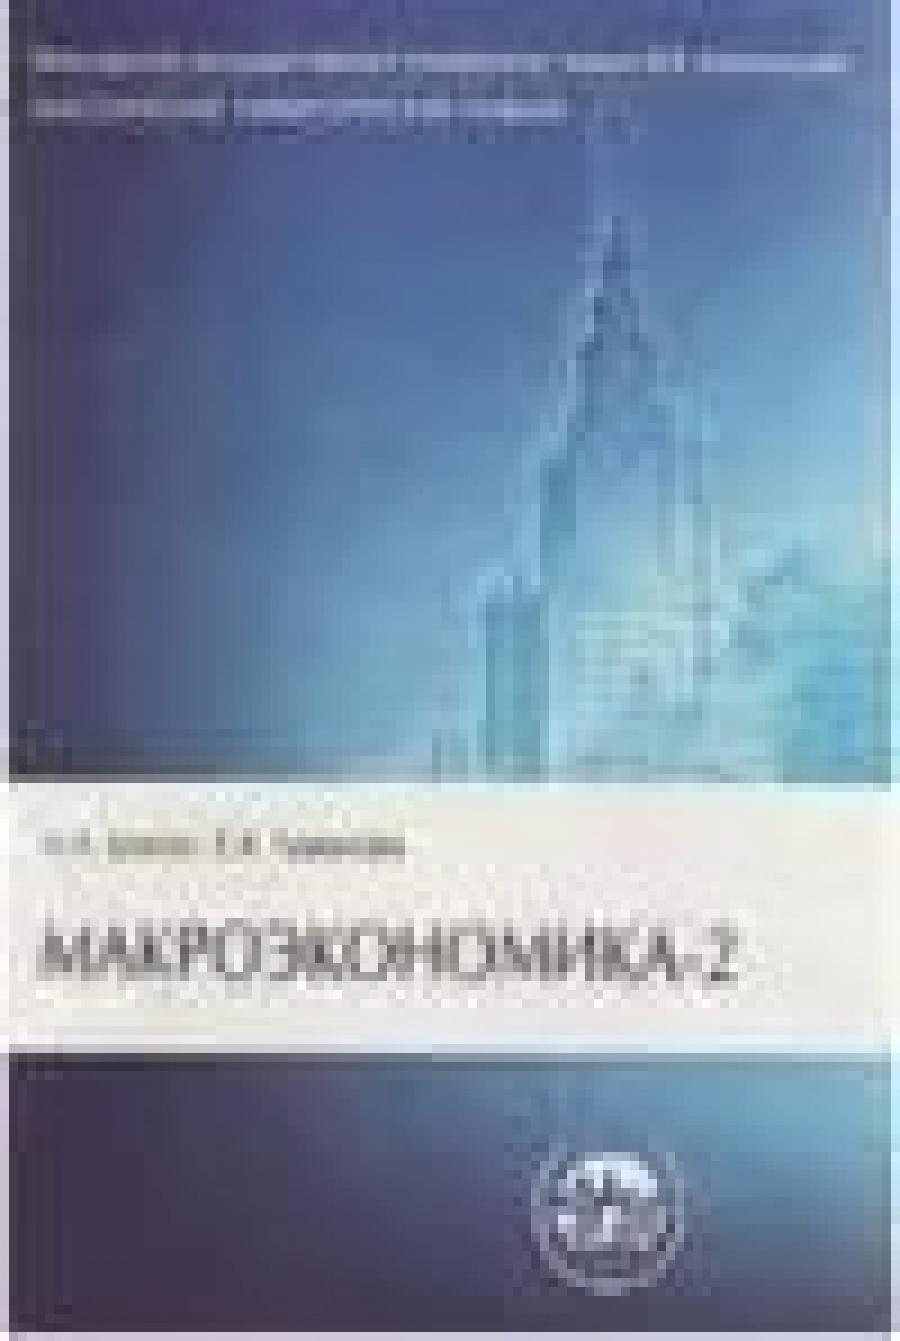 Обложка книги:  н.л.шагас, е.а.туманова - макроэкономика-2